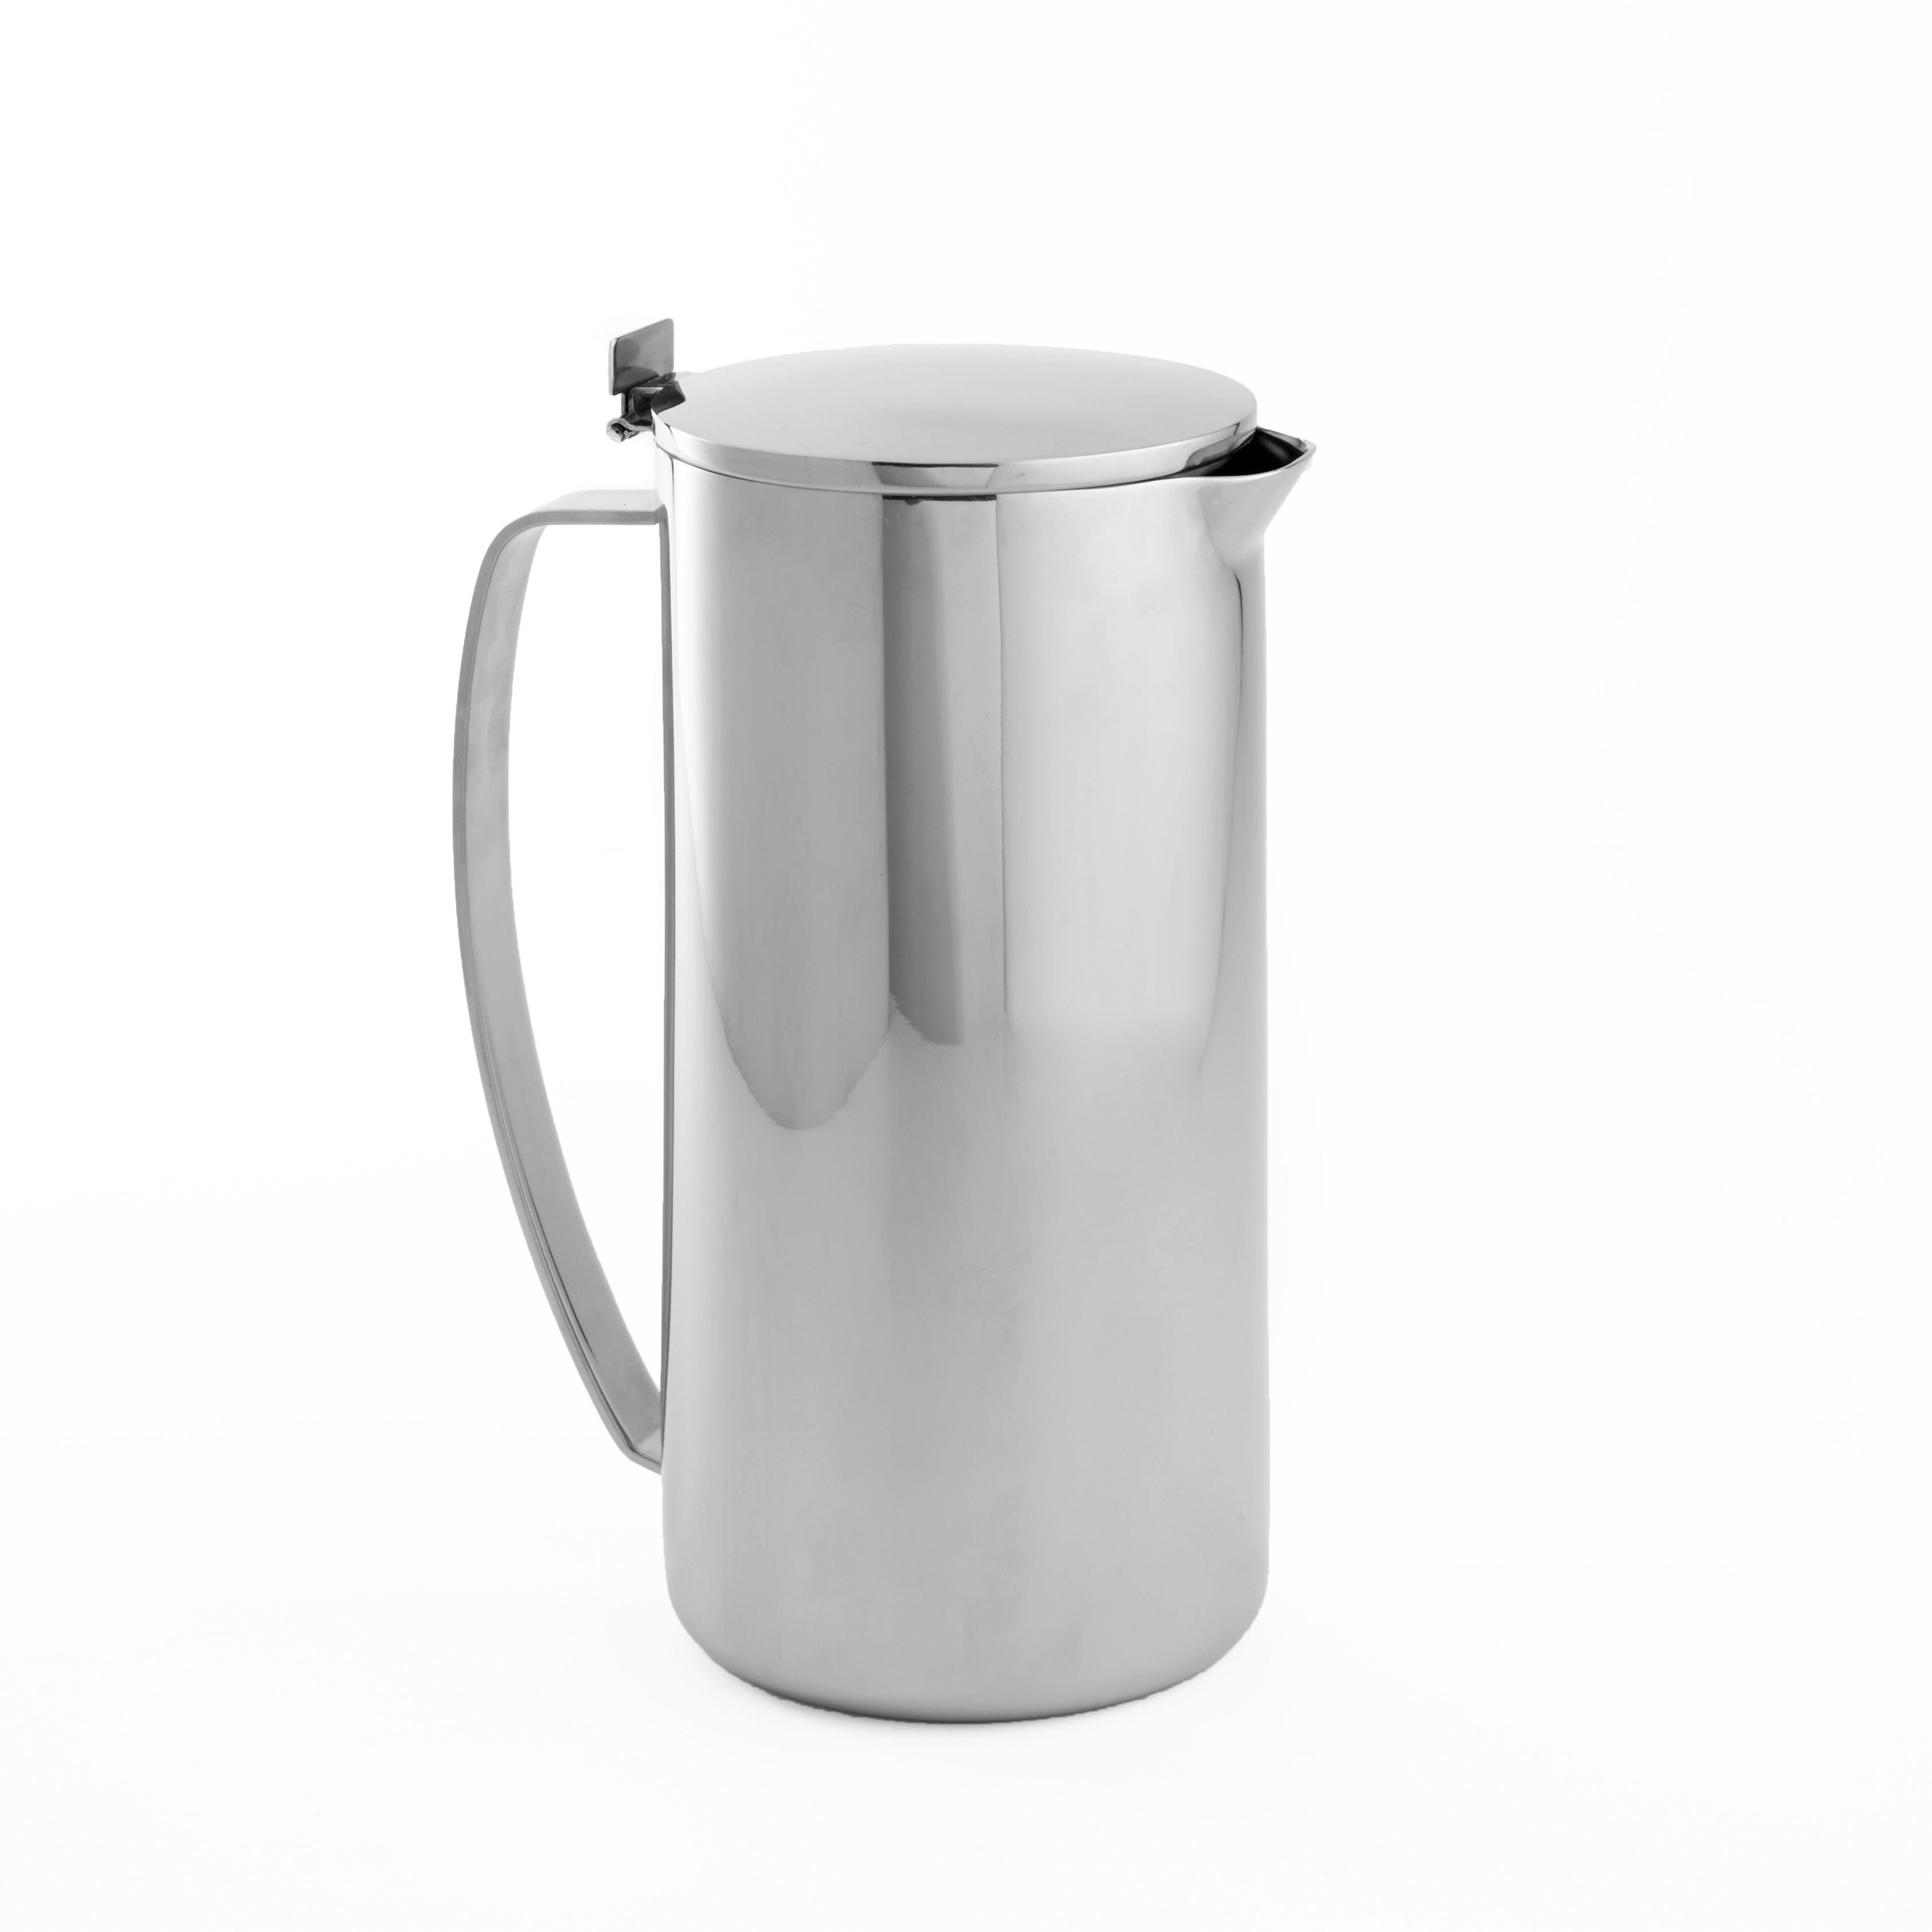 feaaddfeabdfae - Över bilder om pitchers på pinterestbeautiful och drycker online getcheap stainless steel